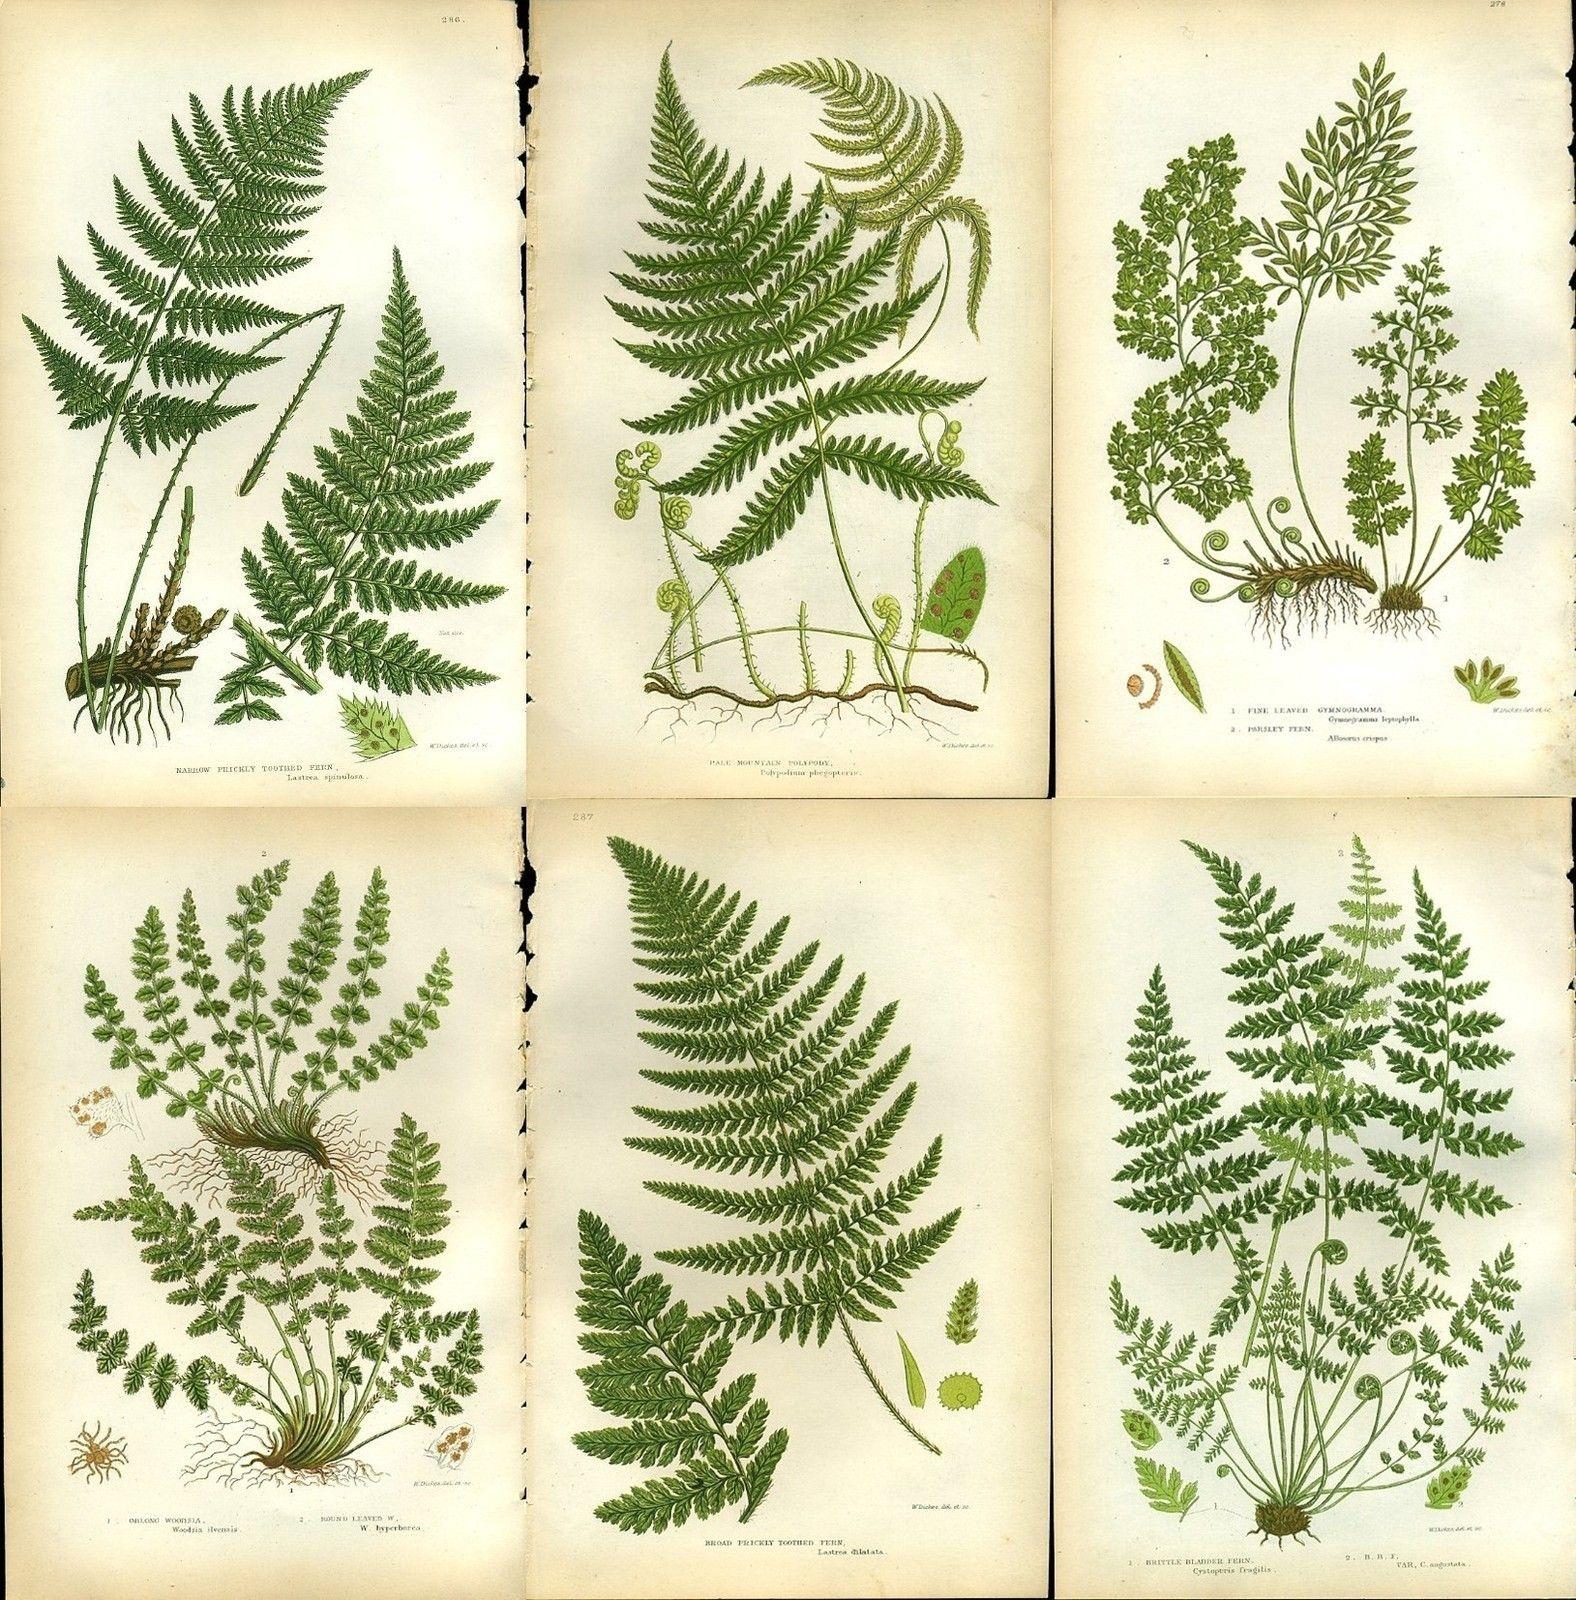 No 69 Green Fern Frond Antique Fern Chromolithograph ORIGINAL Print Chartreuse Mountain Fern Summer Antique 1880 Edward Lowe Fern